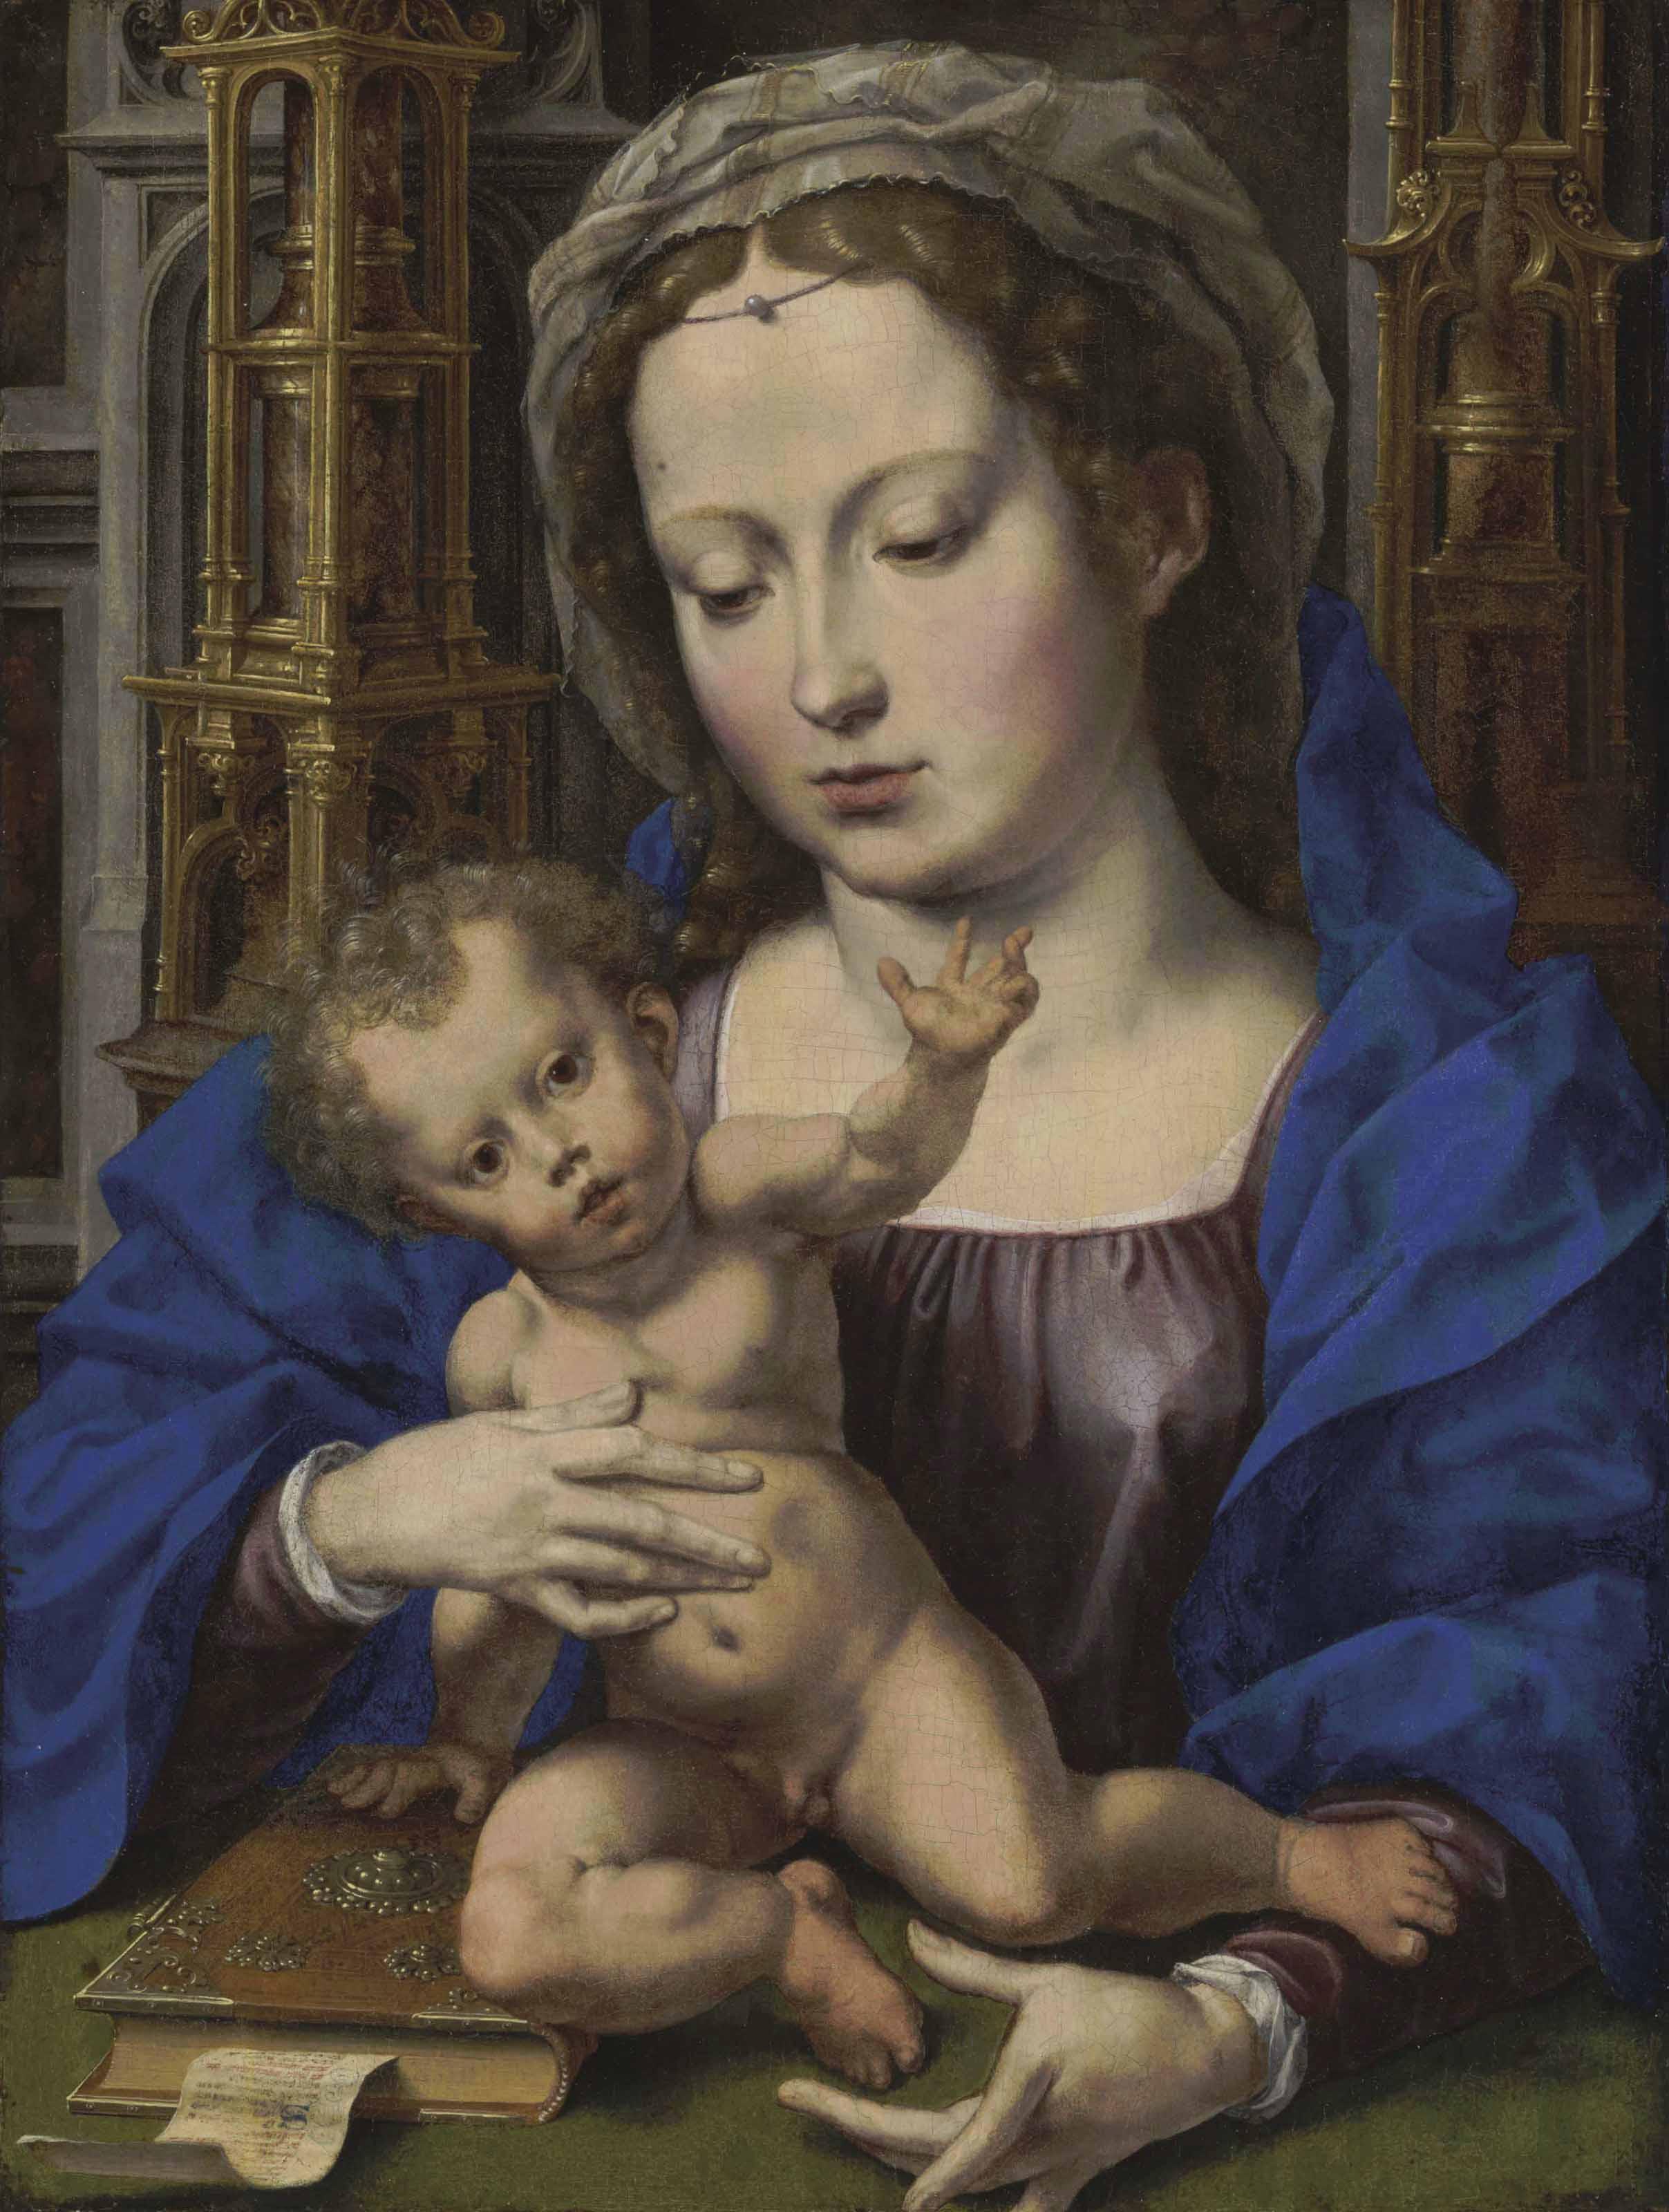 Jan Gossart, called Mabuse (?Maubeuge c. 1478-1532 ?Antwerp)